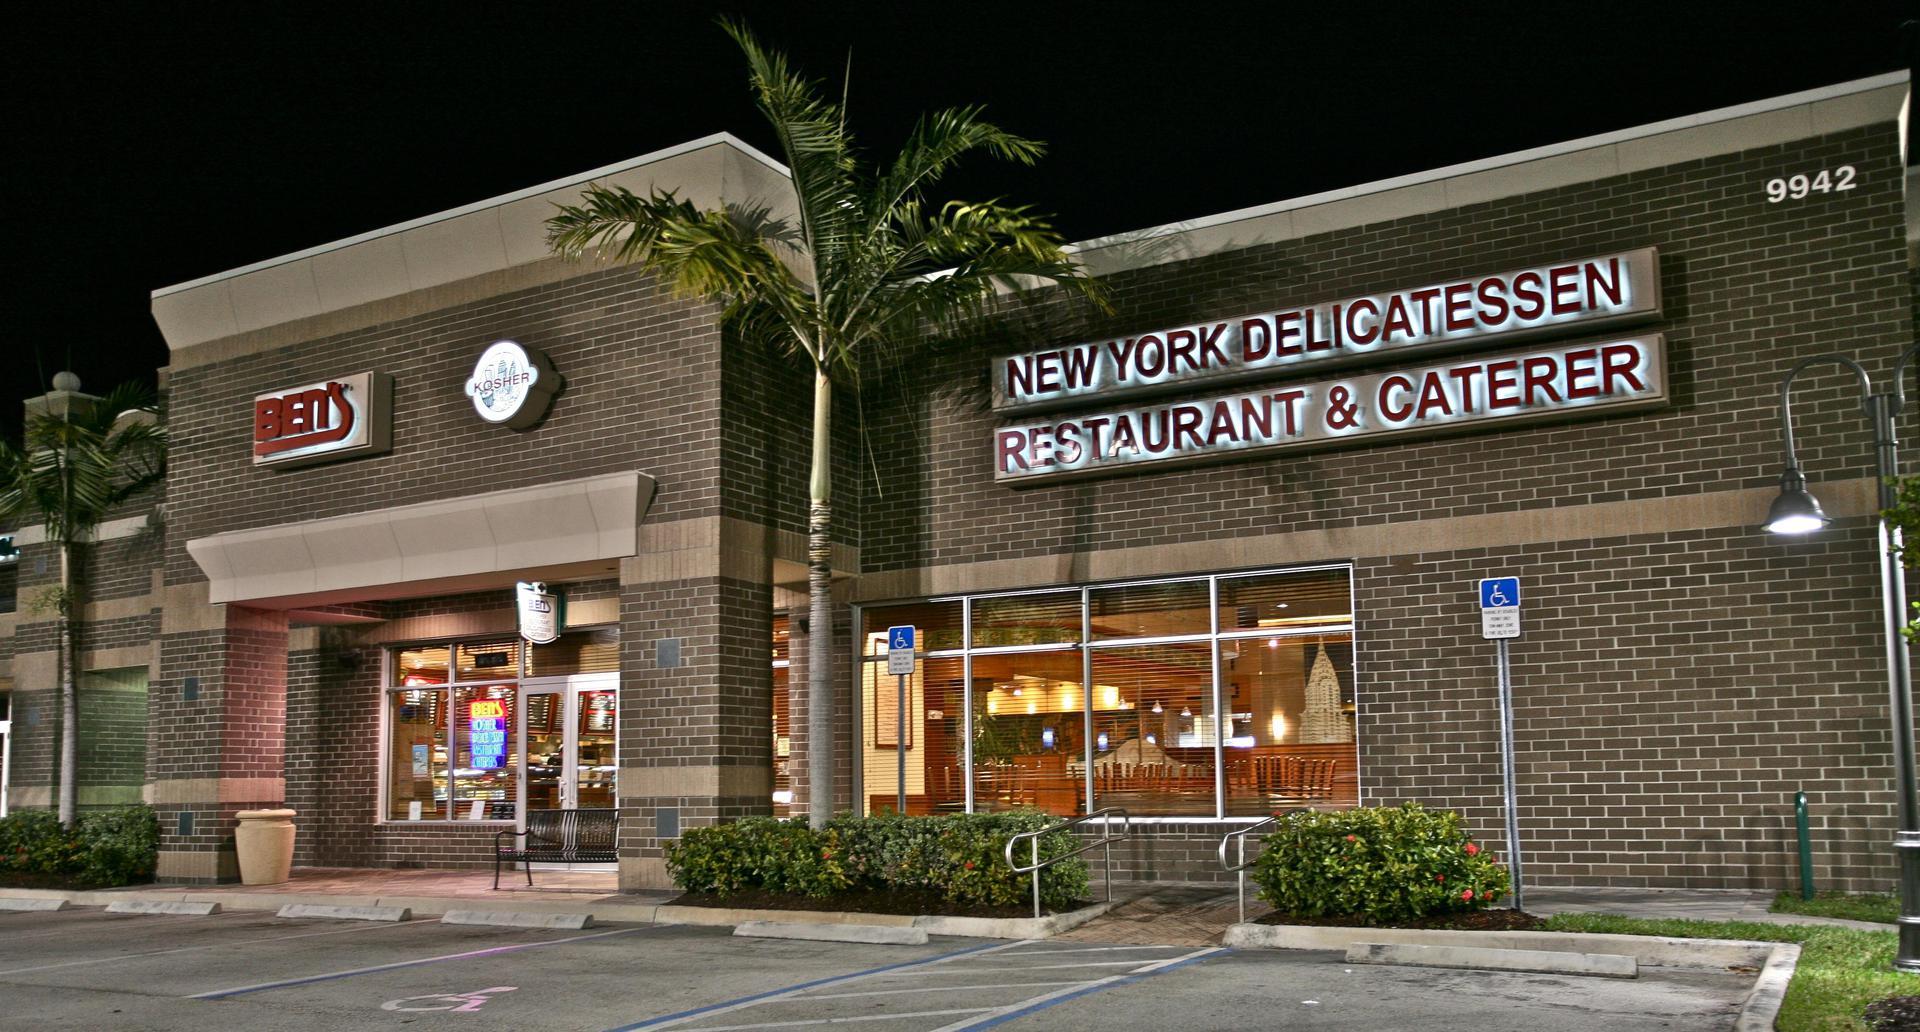 Ben's In Boca Raton, FL